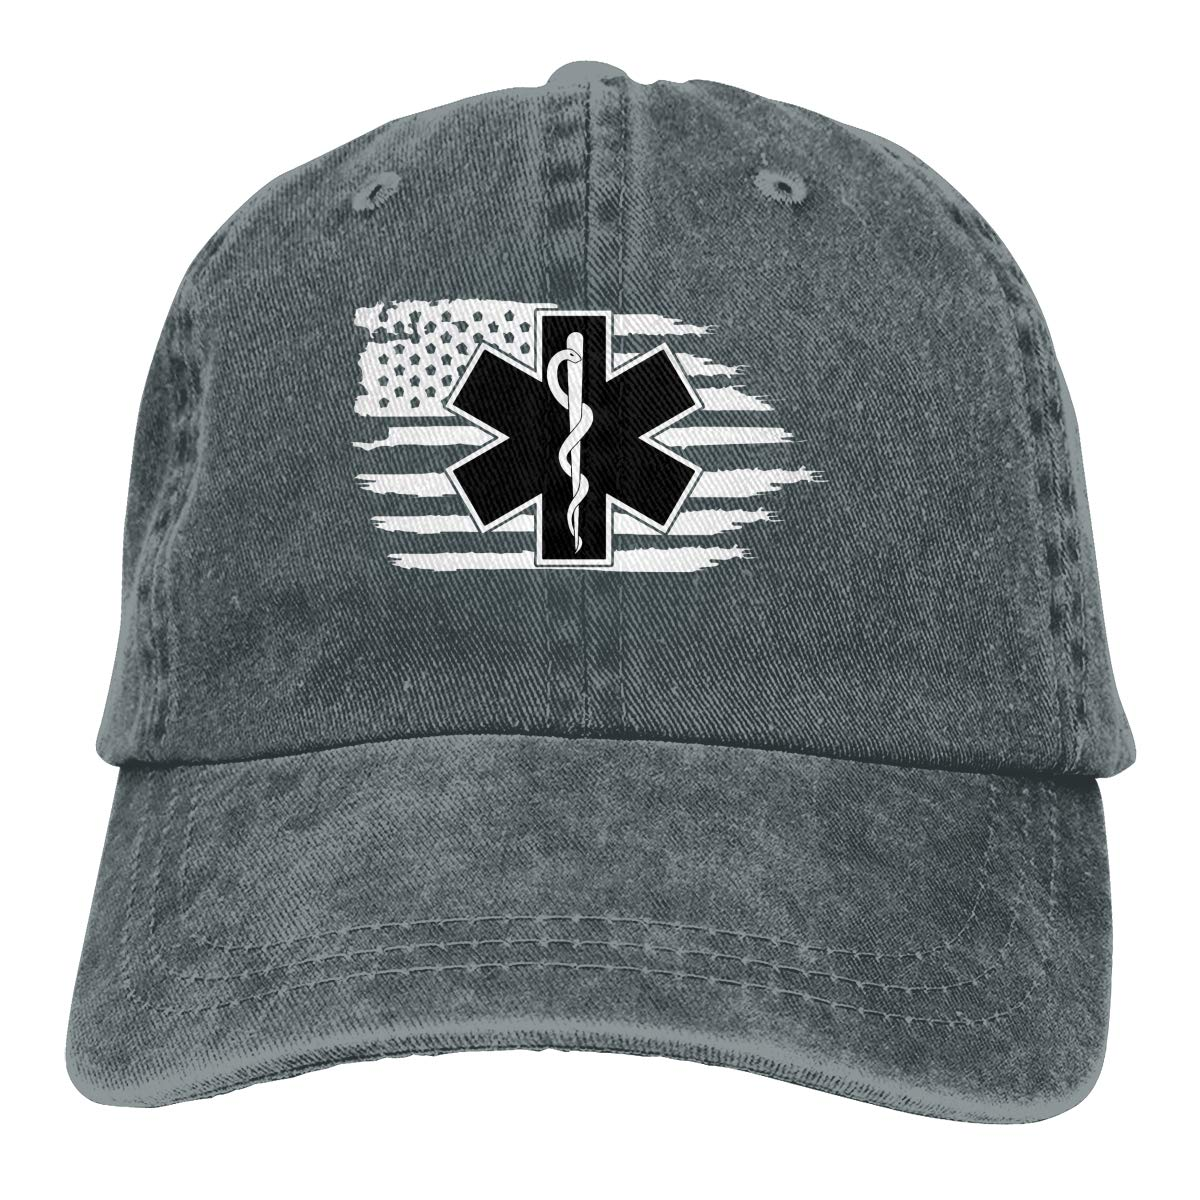 Bandera Americana EMS estrella de la vida EMT paramédico médico gorra de béisbol papá sombrero ajustable gorra gorro desestructurado visera gorra